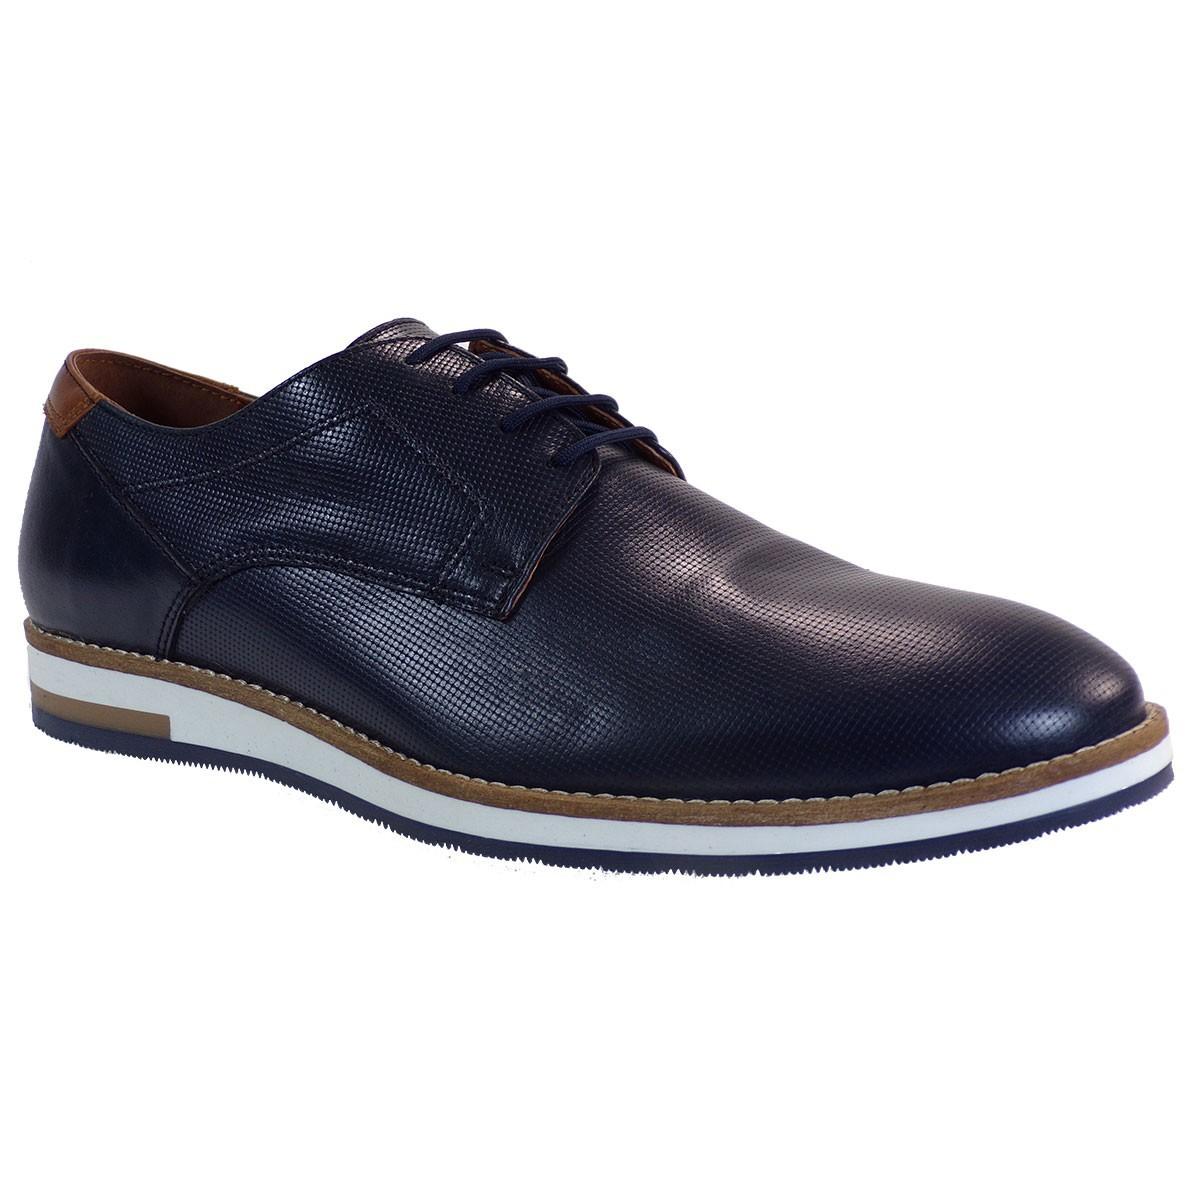 Robinson Ανδρικά Παπούτσια 2131 Mπλέ Δέρμα